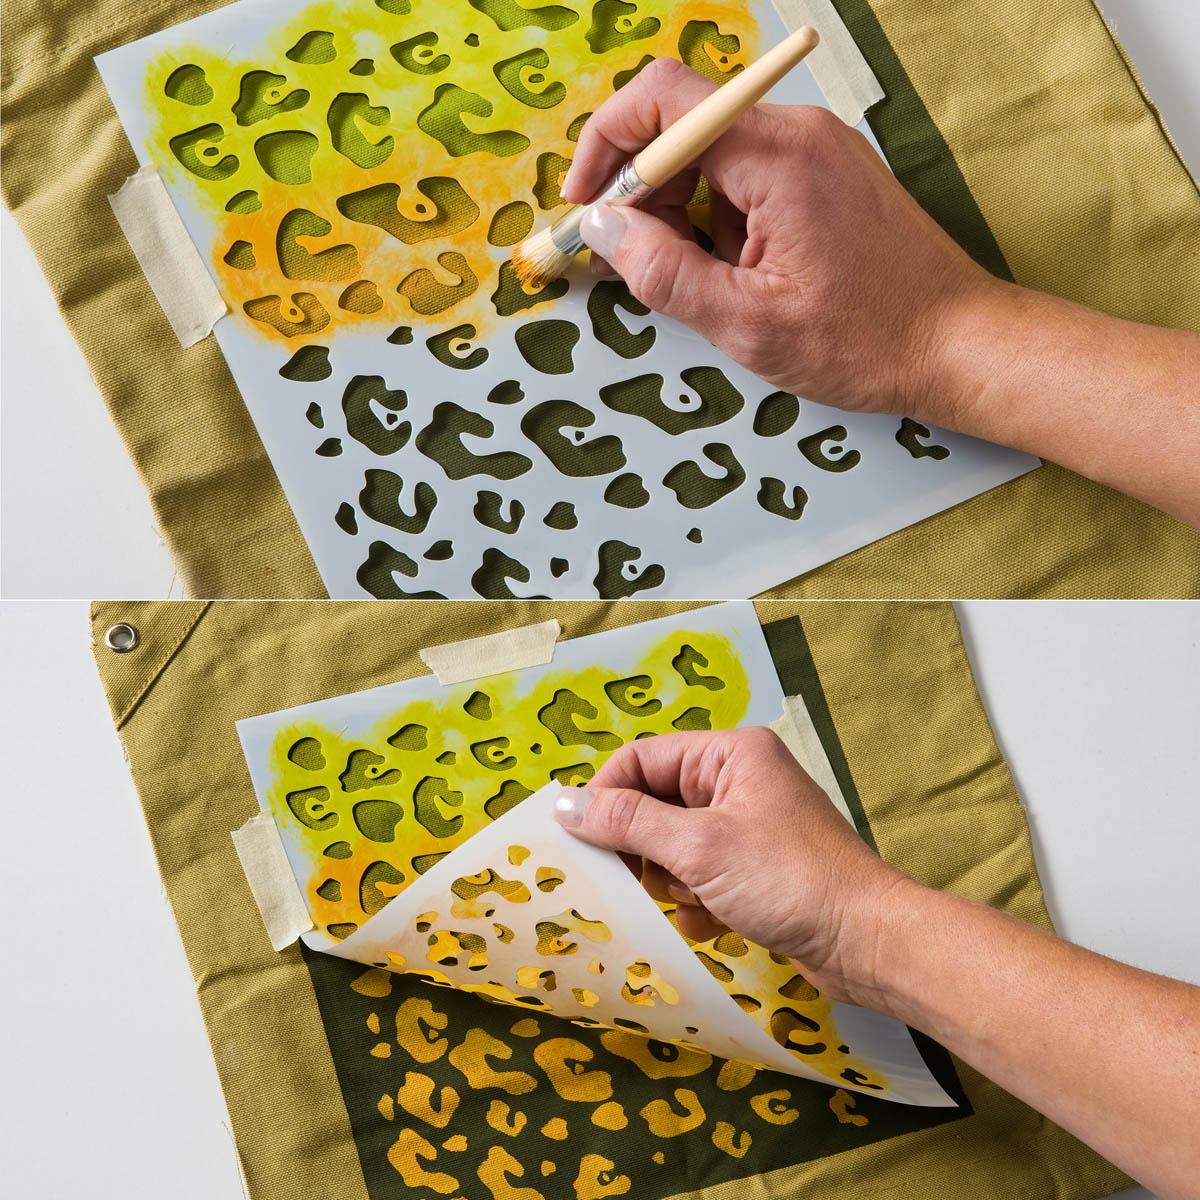 FolkArt ® Painting Stencils - Large - Jaguar